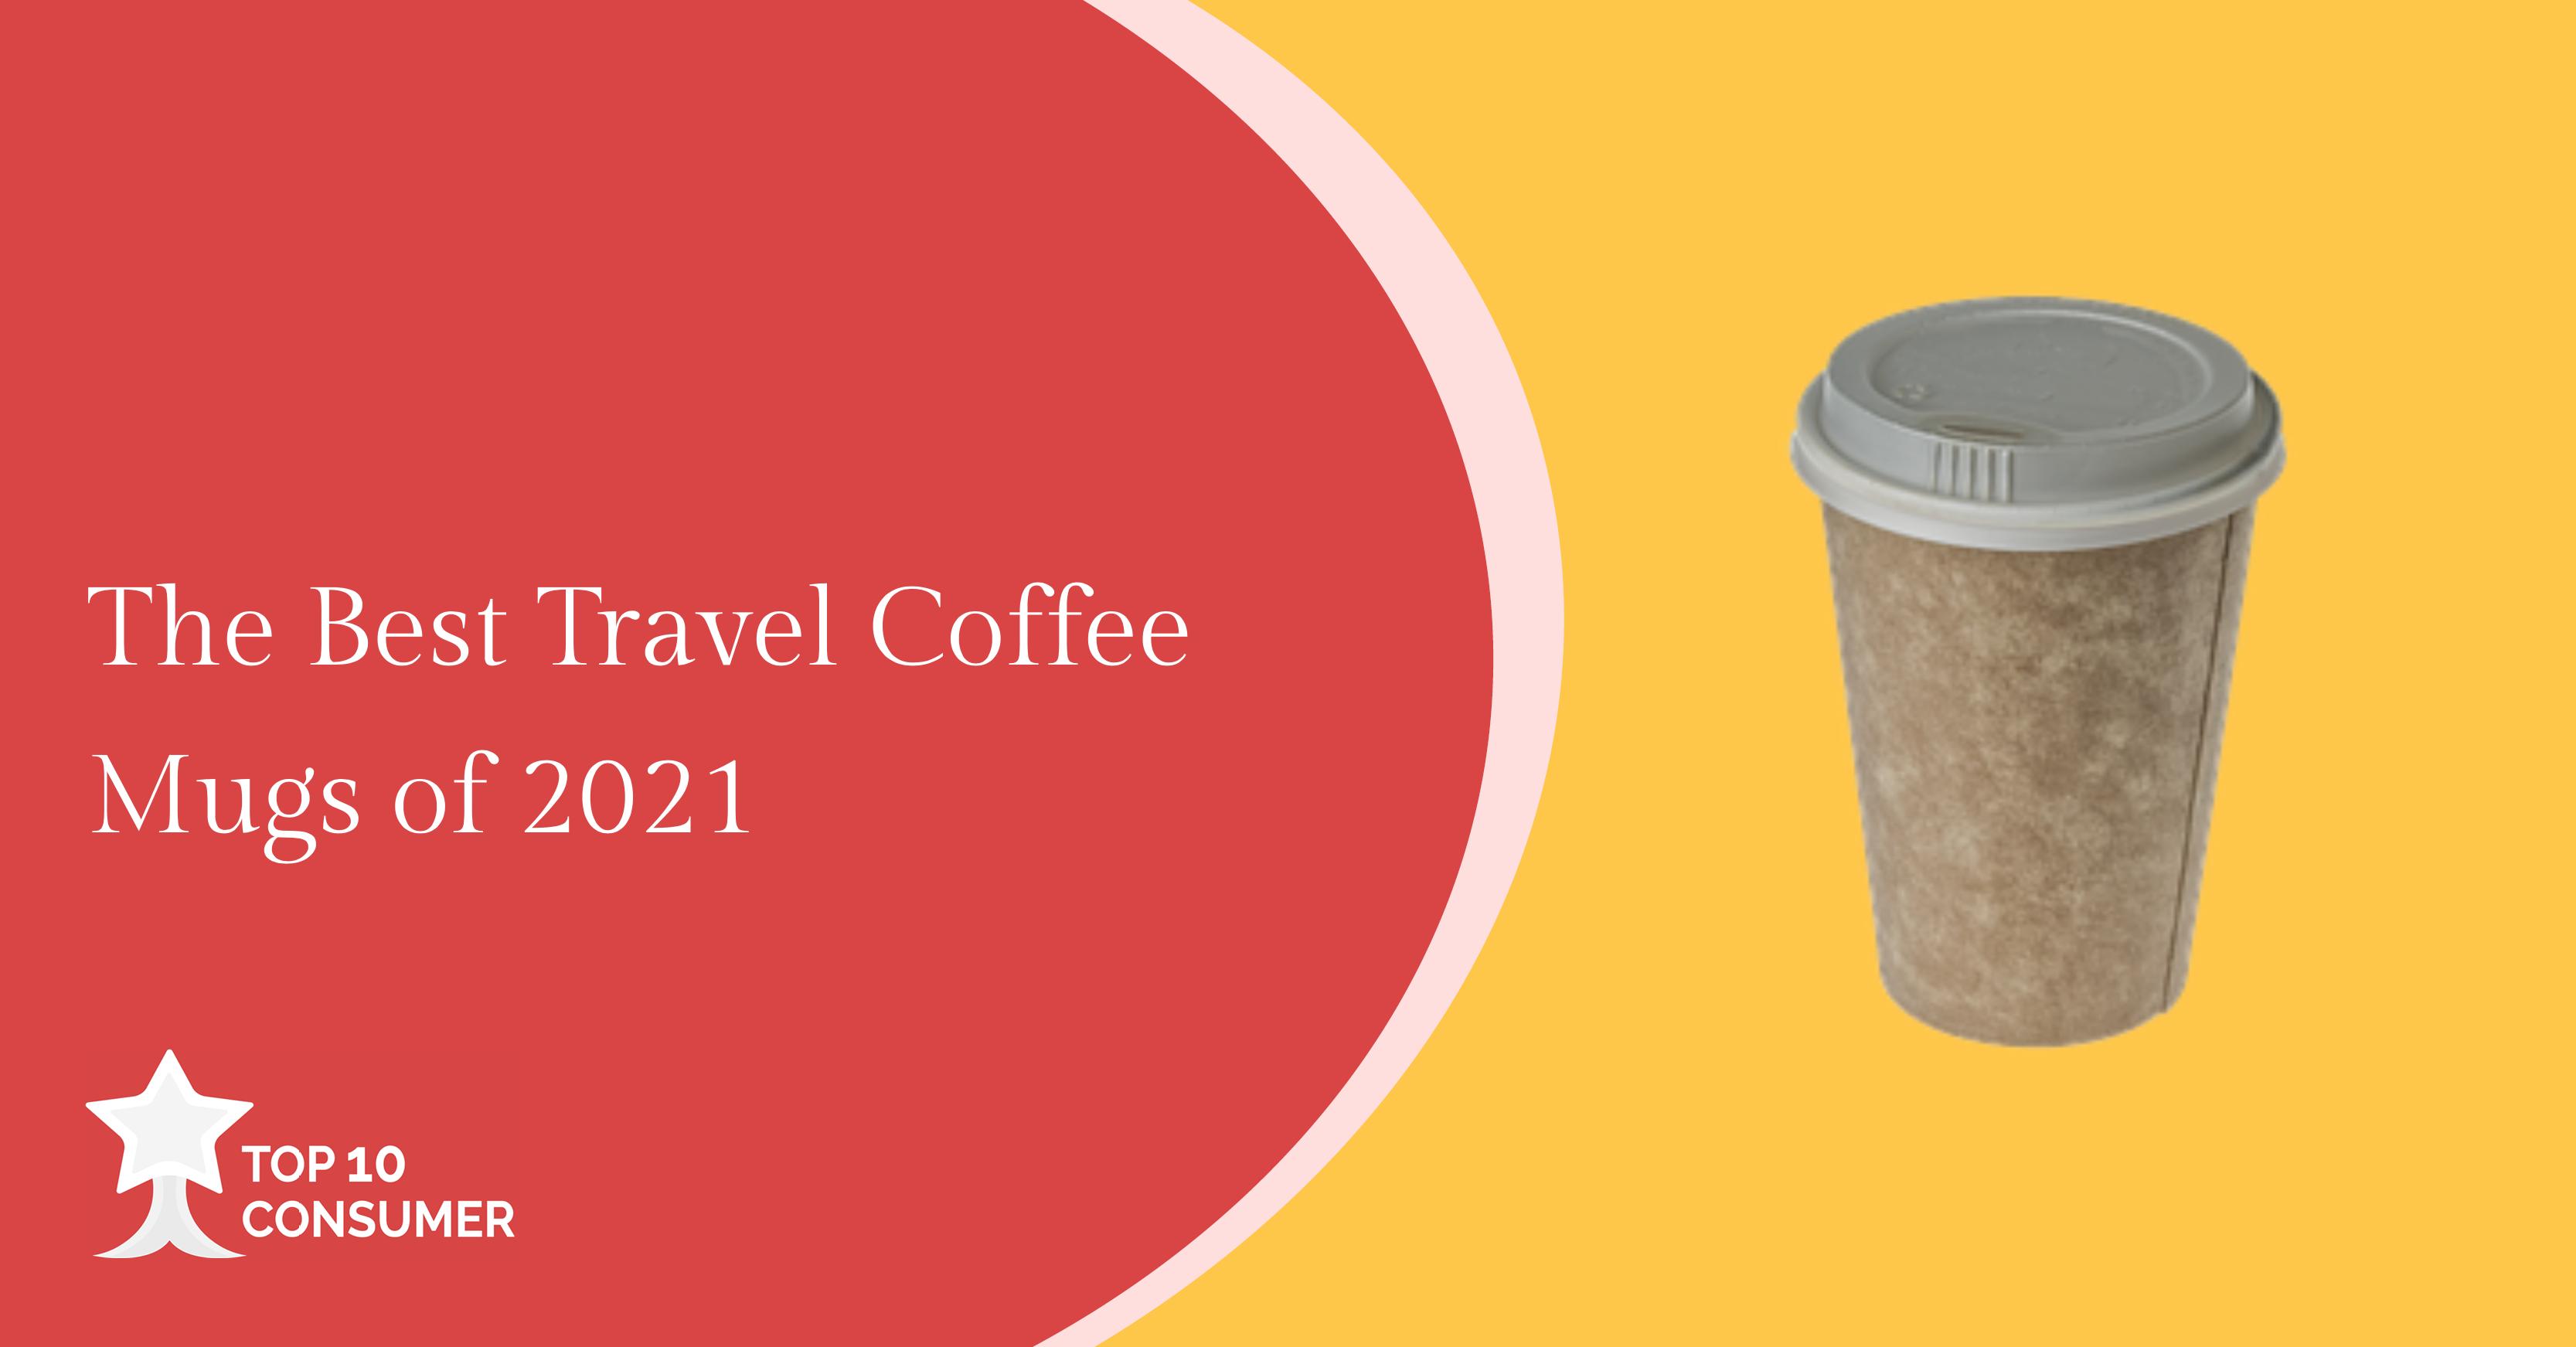 Best Travel Coffee Mug